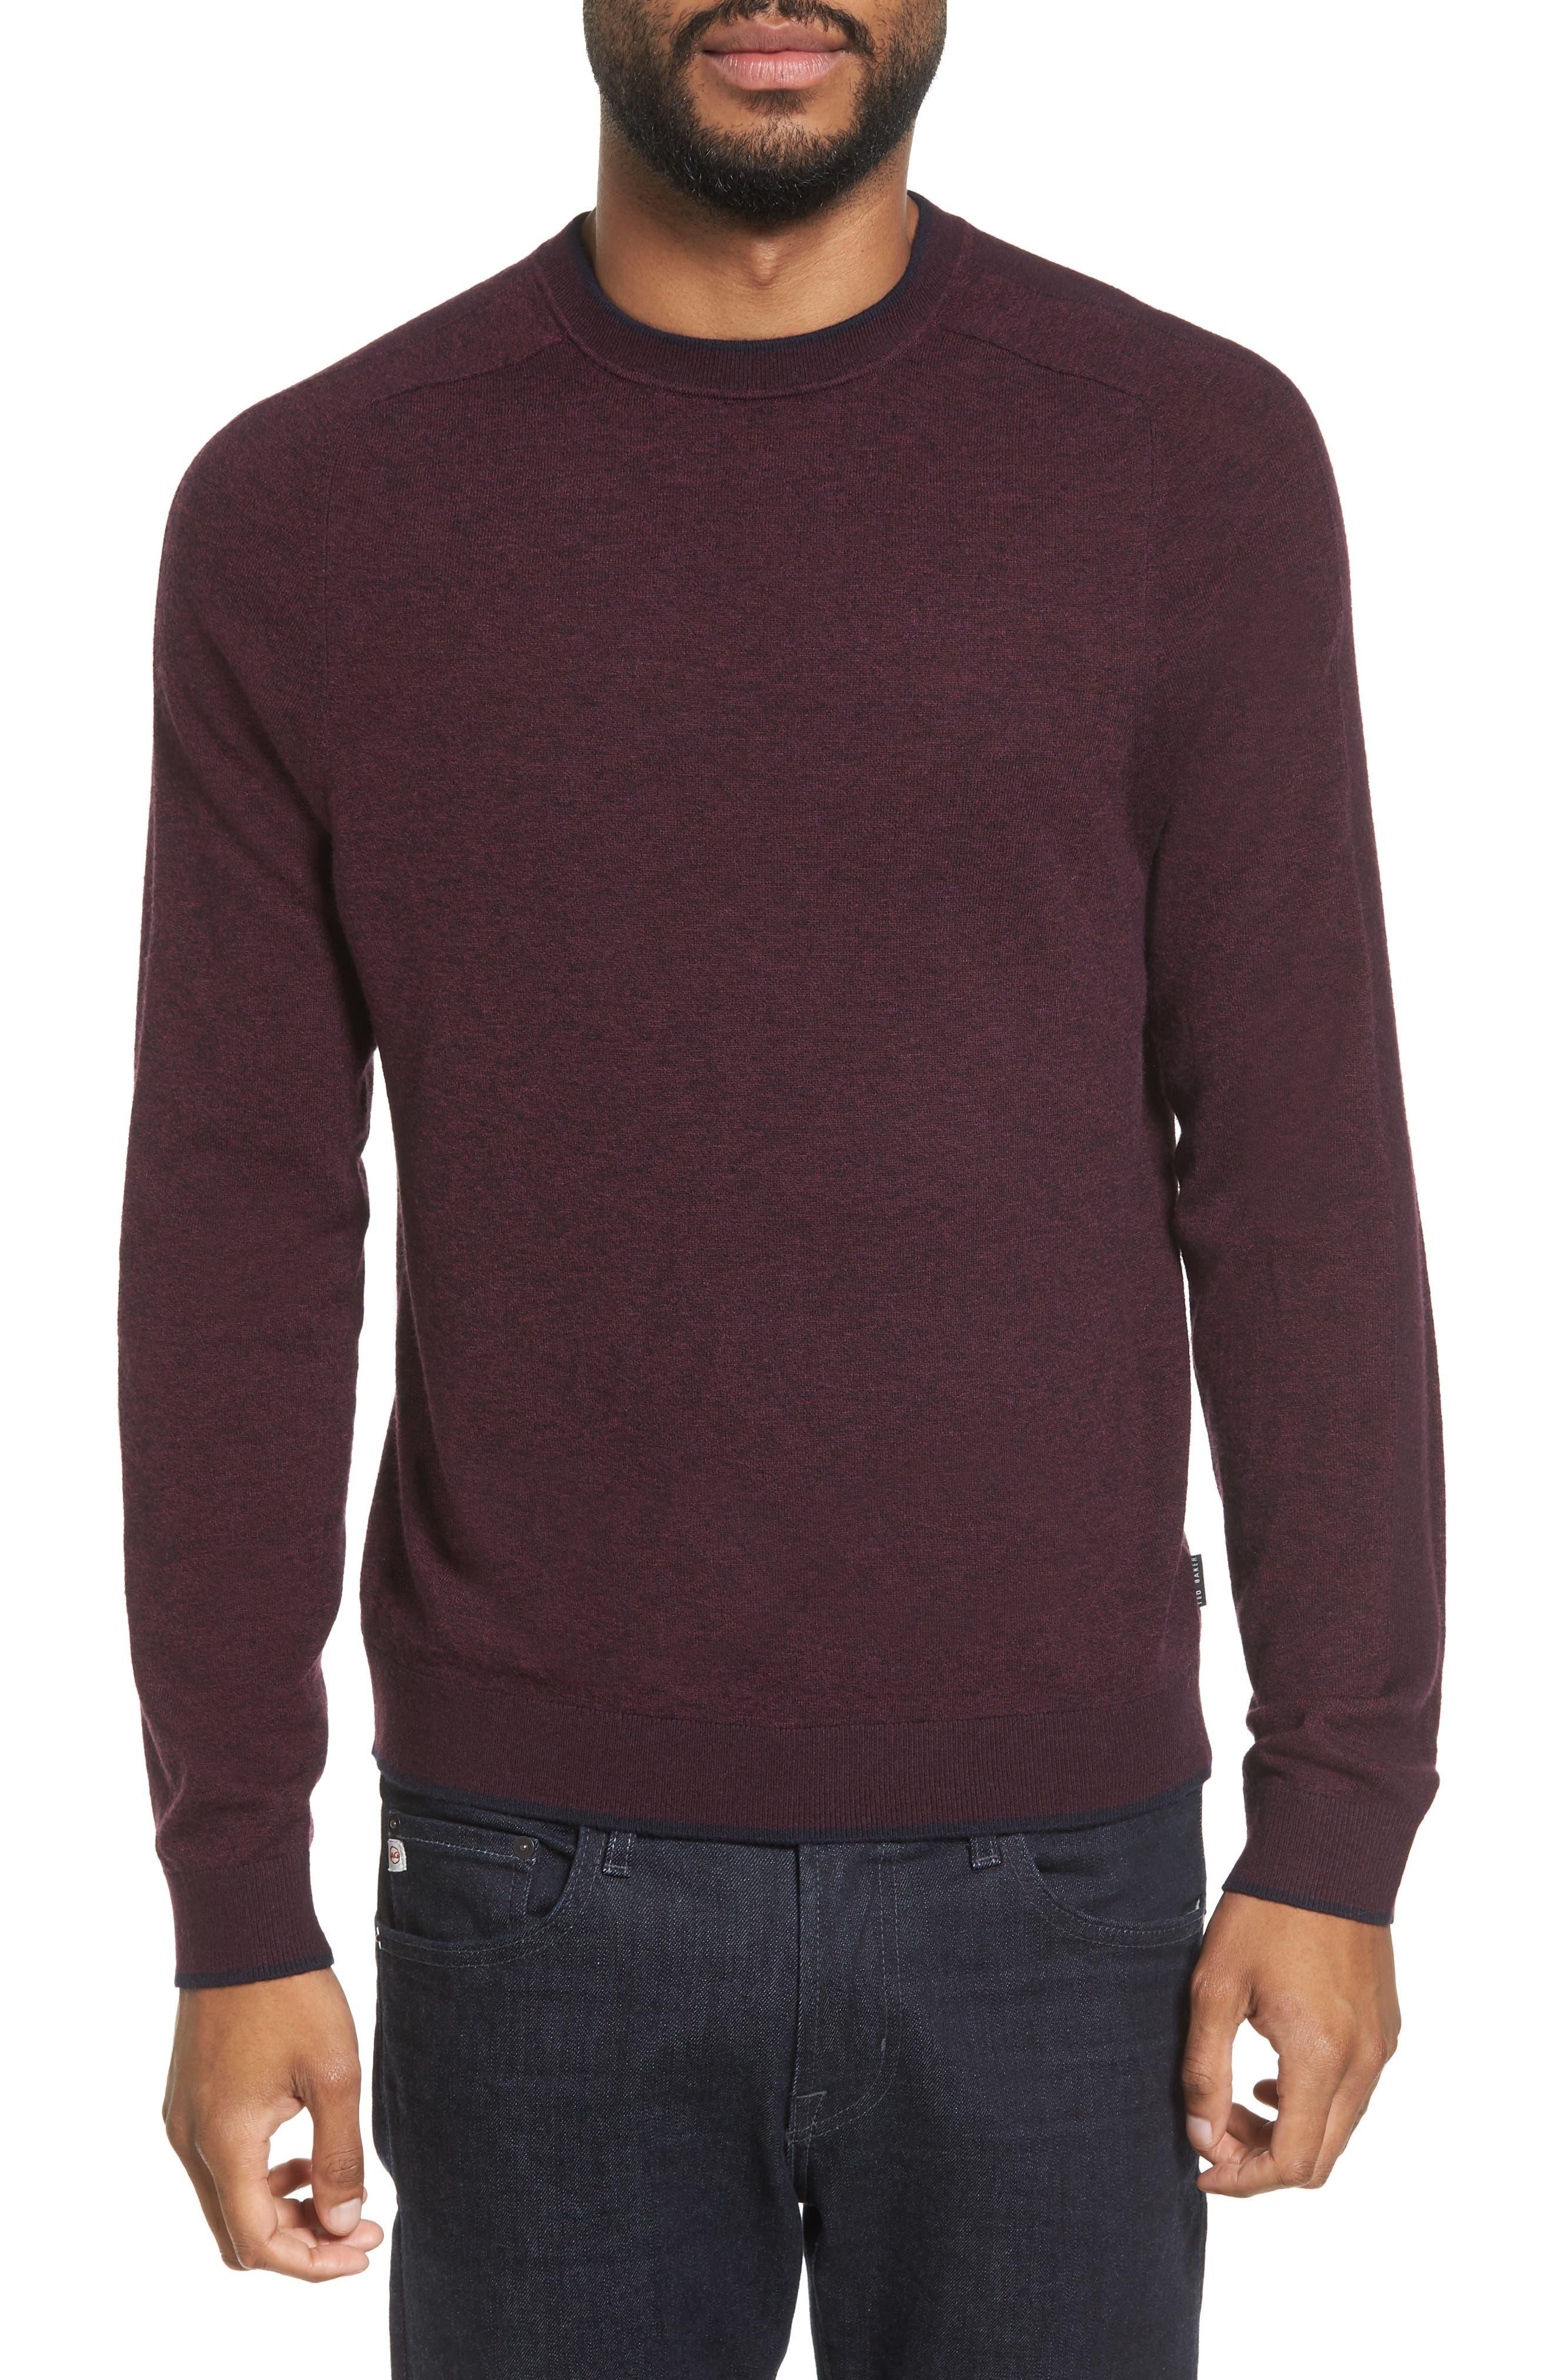 Norpol Crewneck Sweater,                             Main thumbnail 4, color,